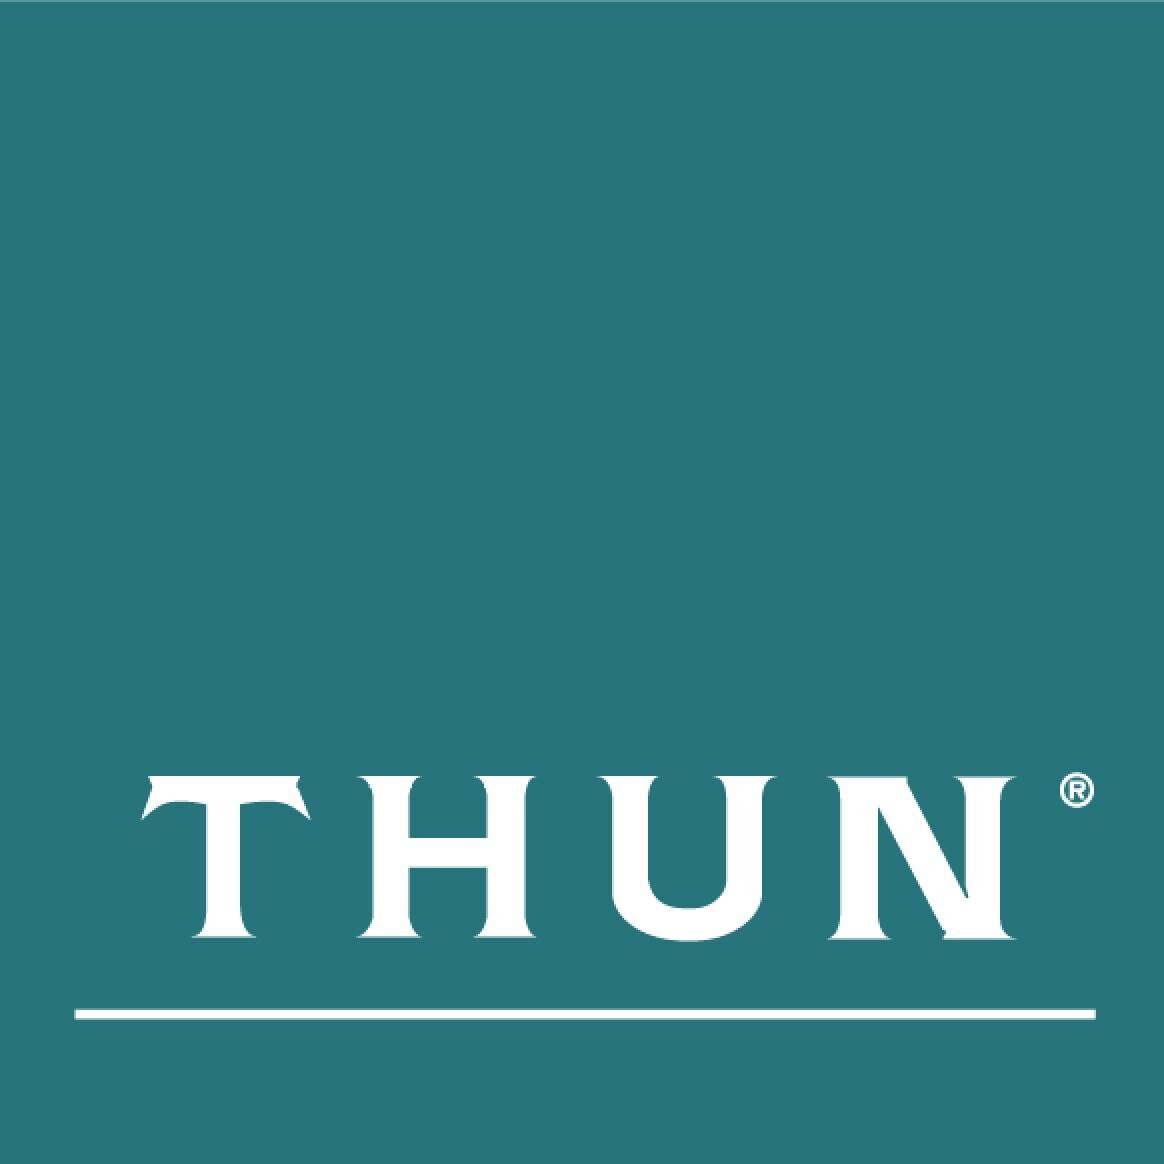 @ThunOfficial